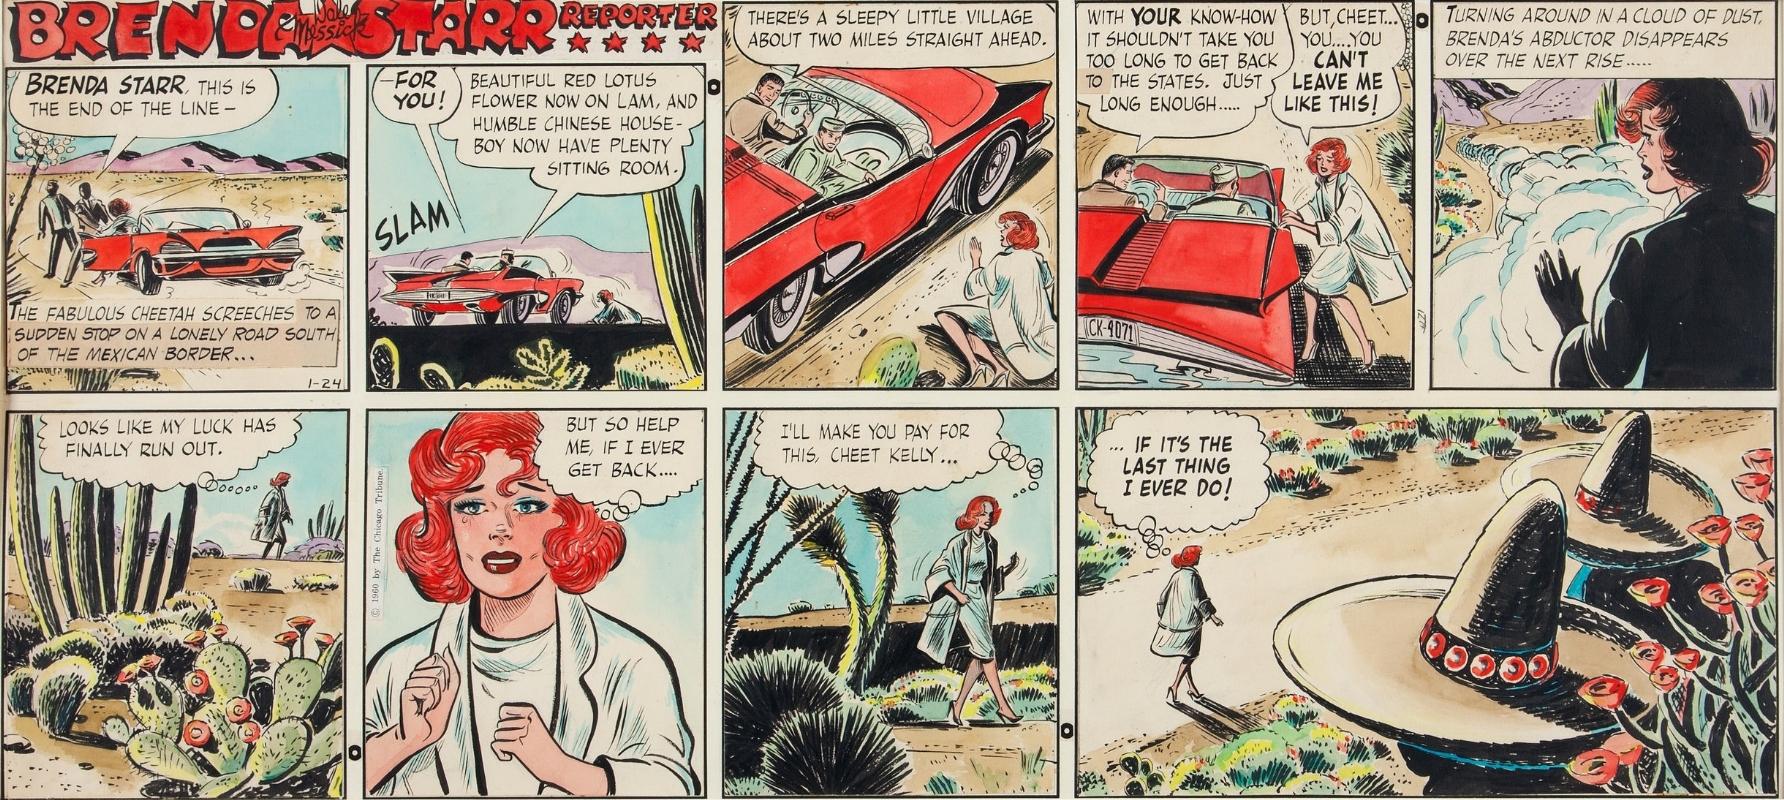 Original Storyboard Artwork From A Brenda Starr Reporter Comic